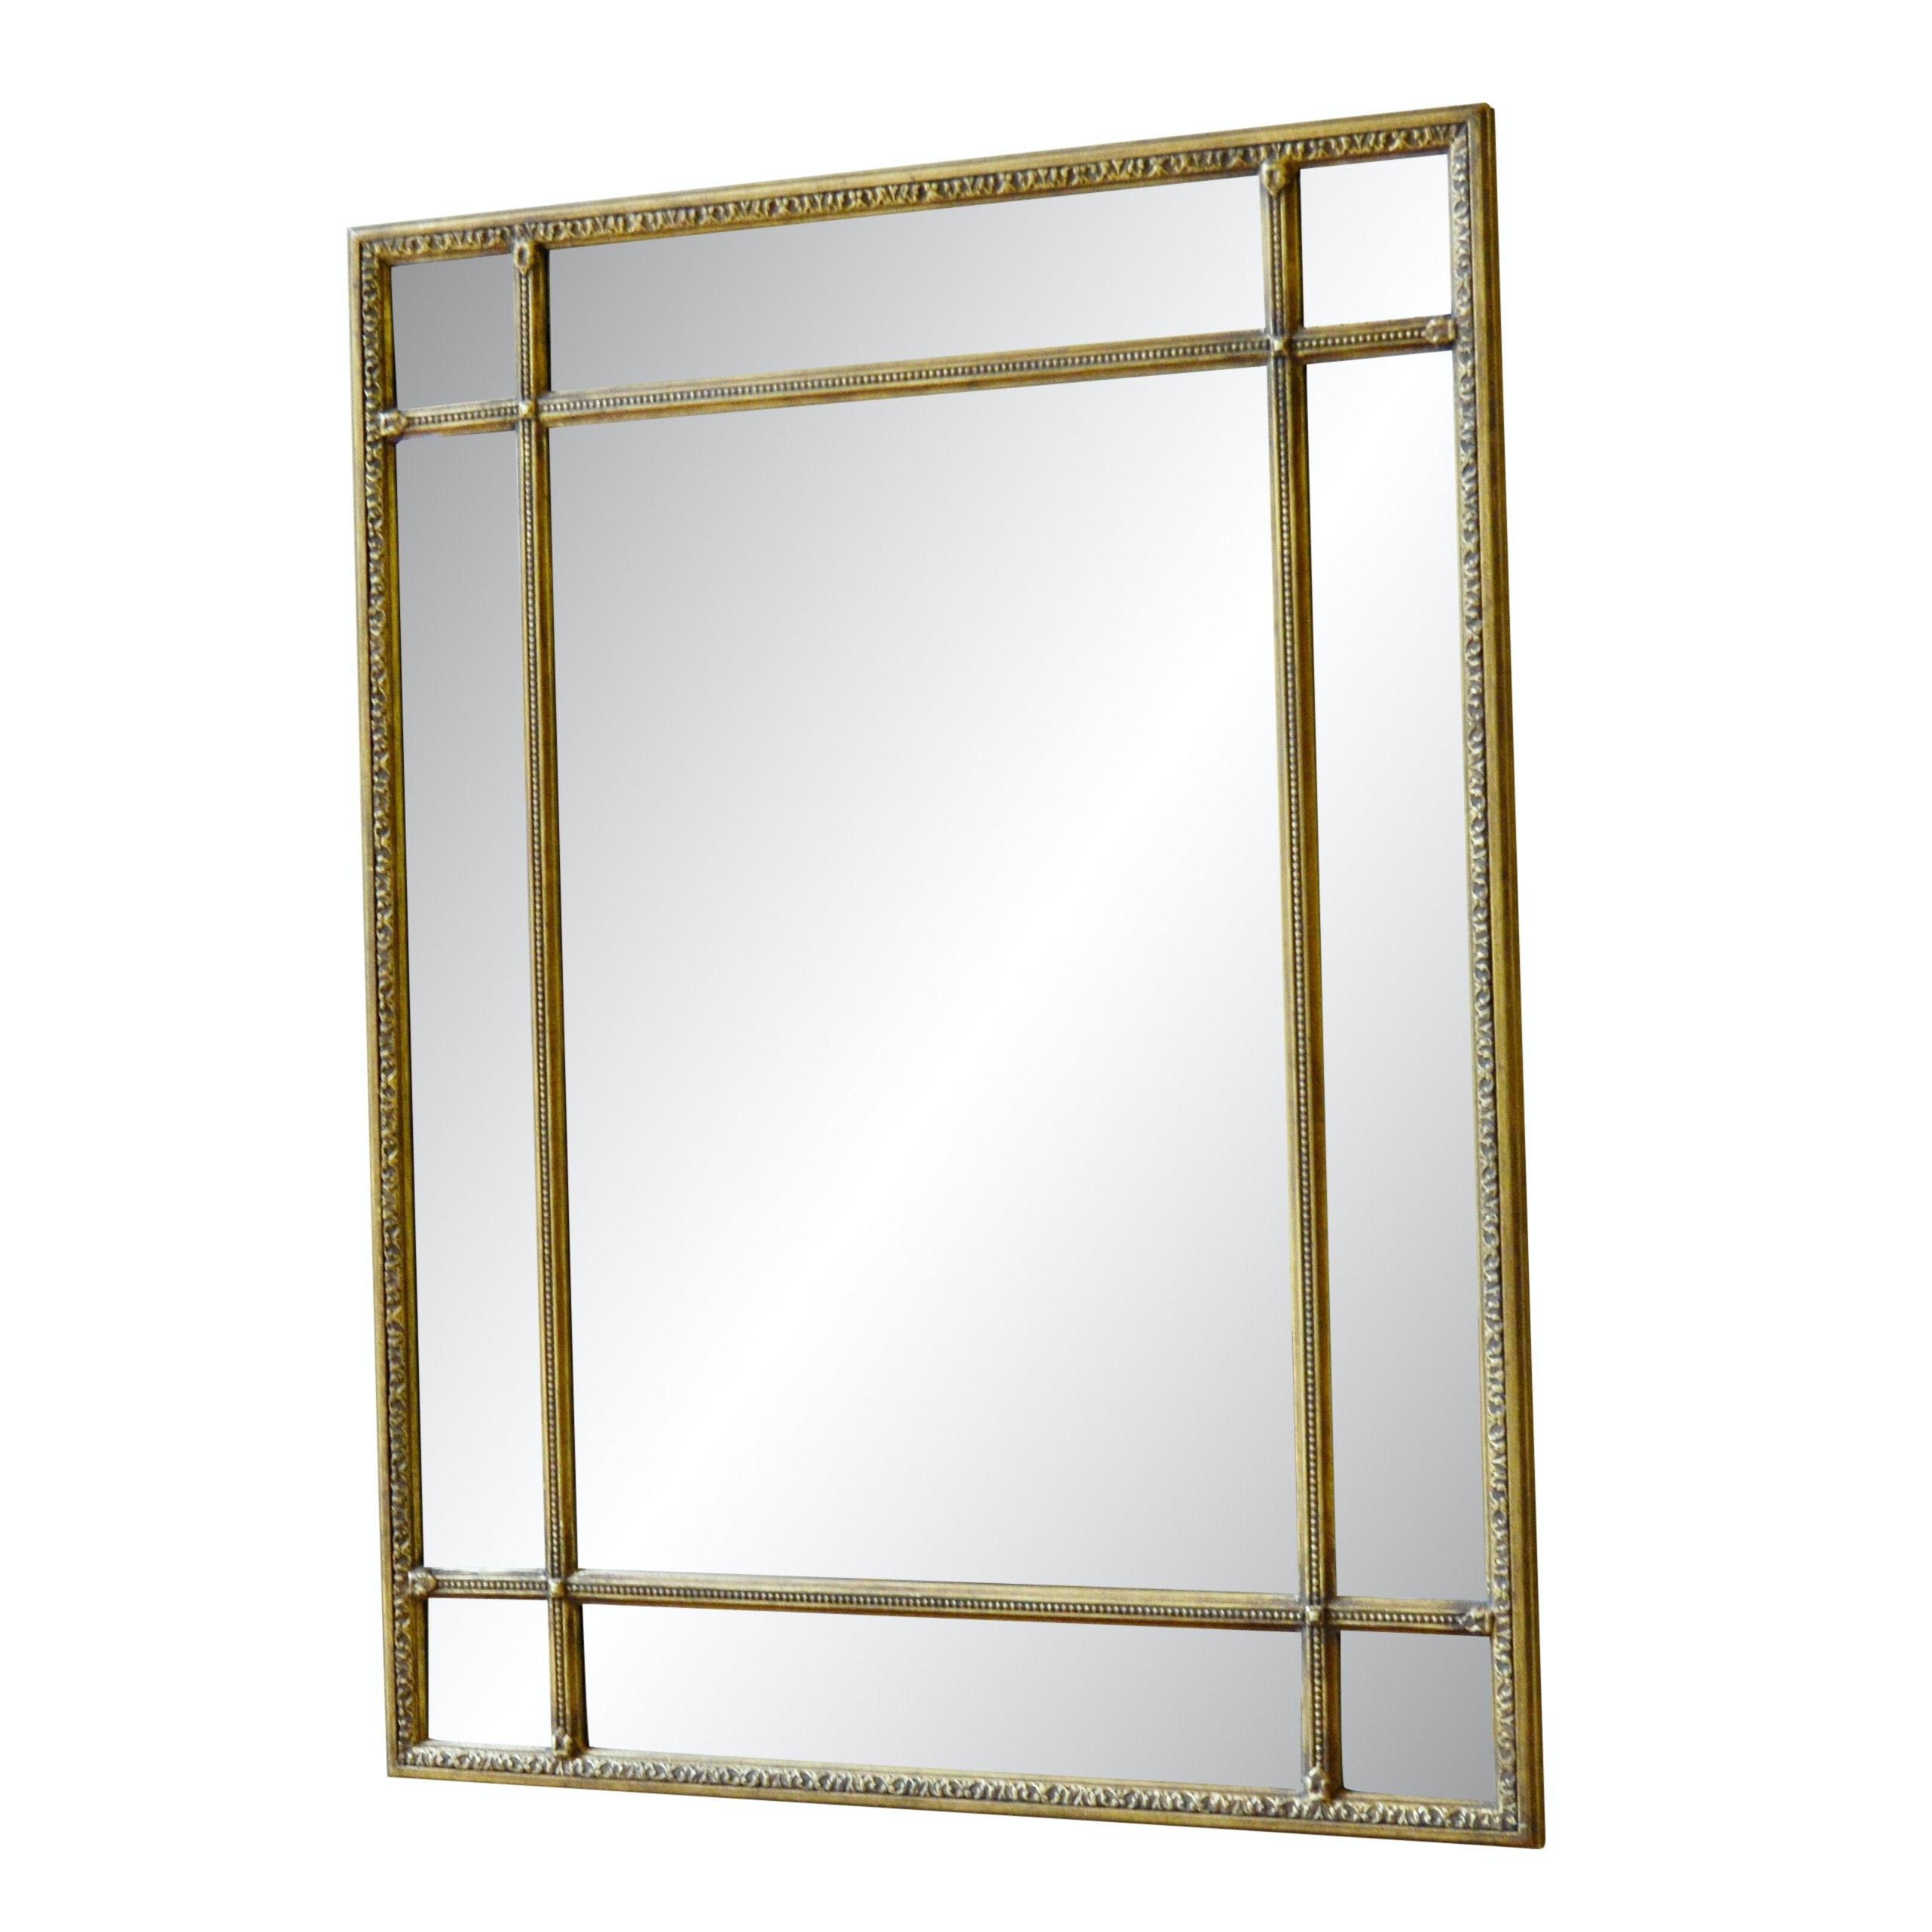 Beveled Glass Panel Wall Mirror